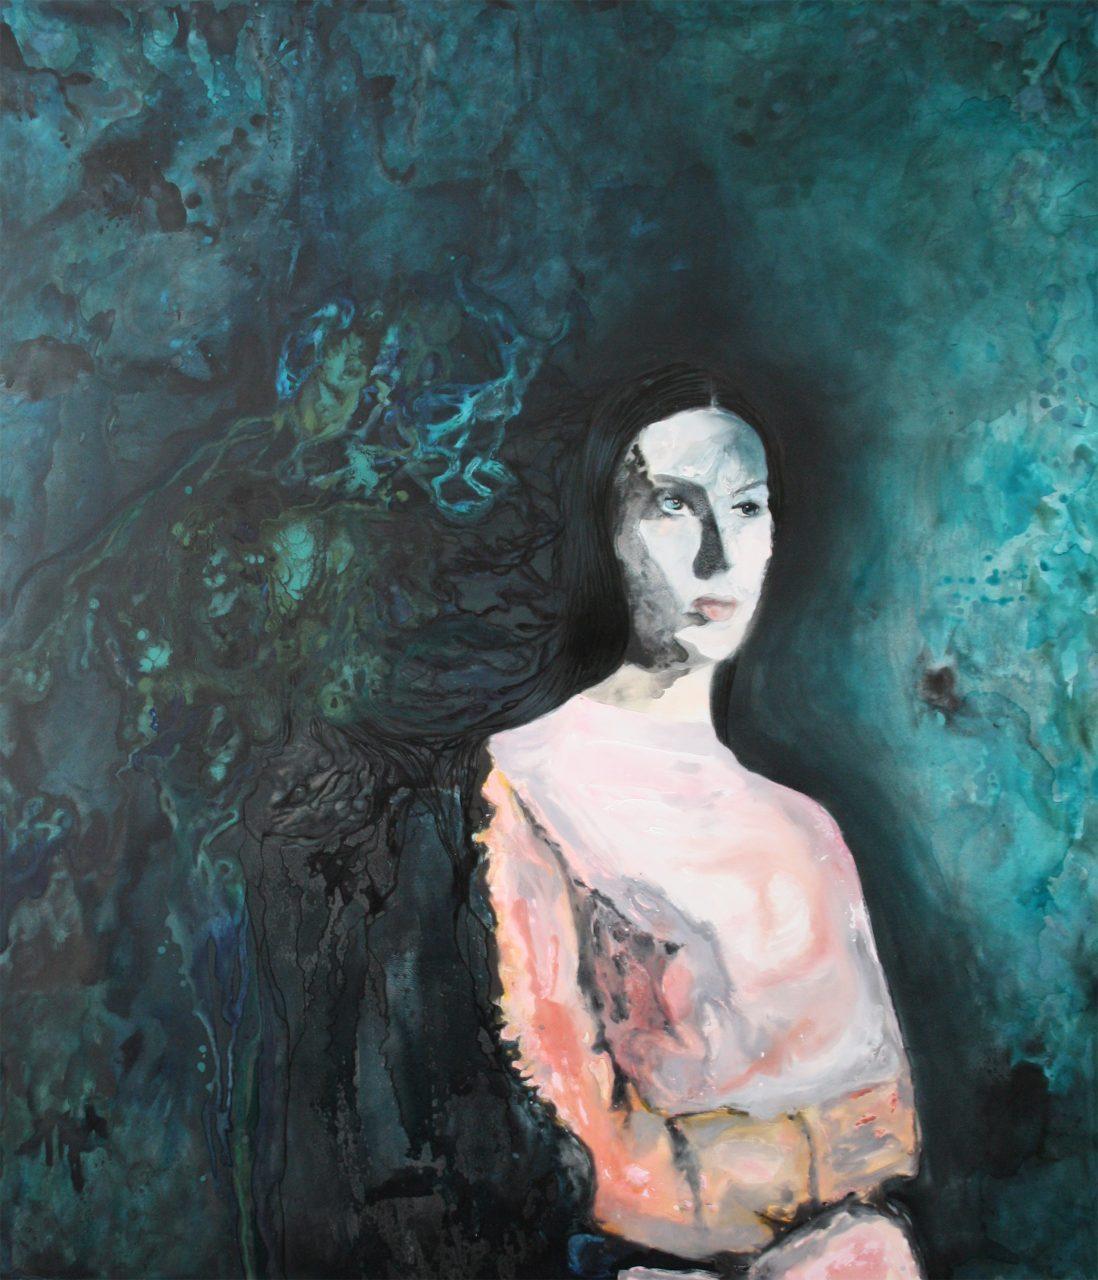 Cosima Hawemann | Profil Image 0